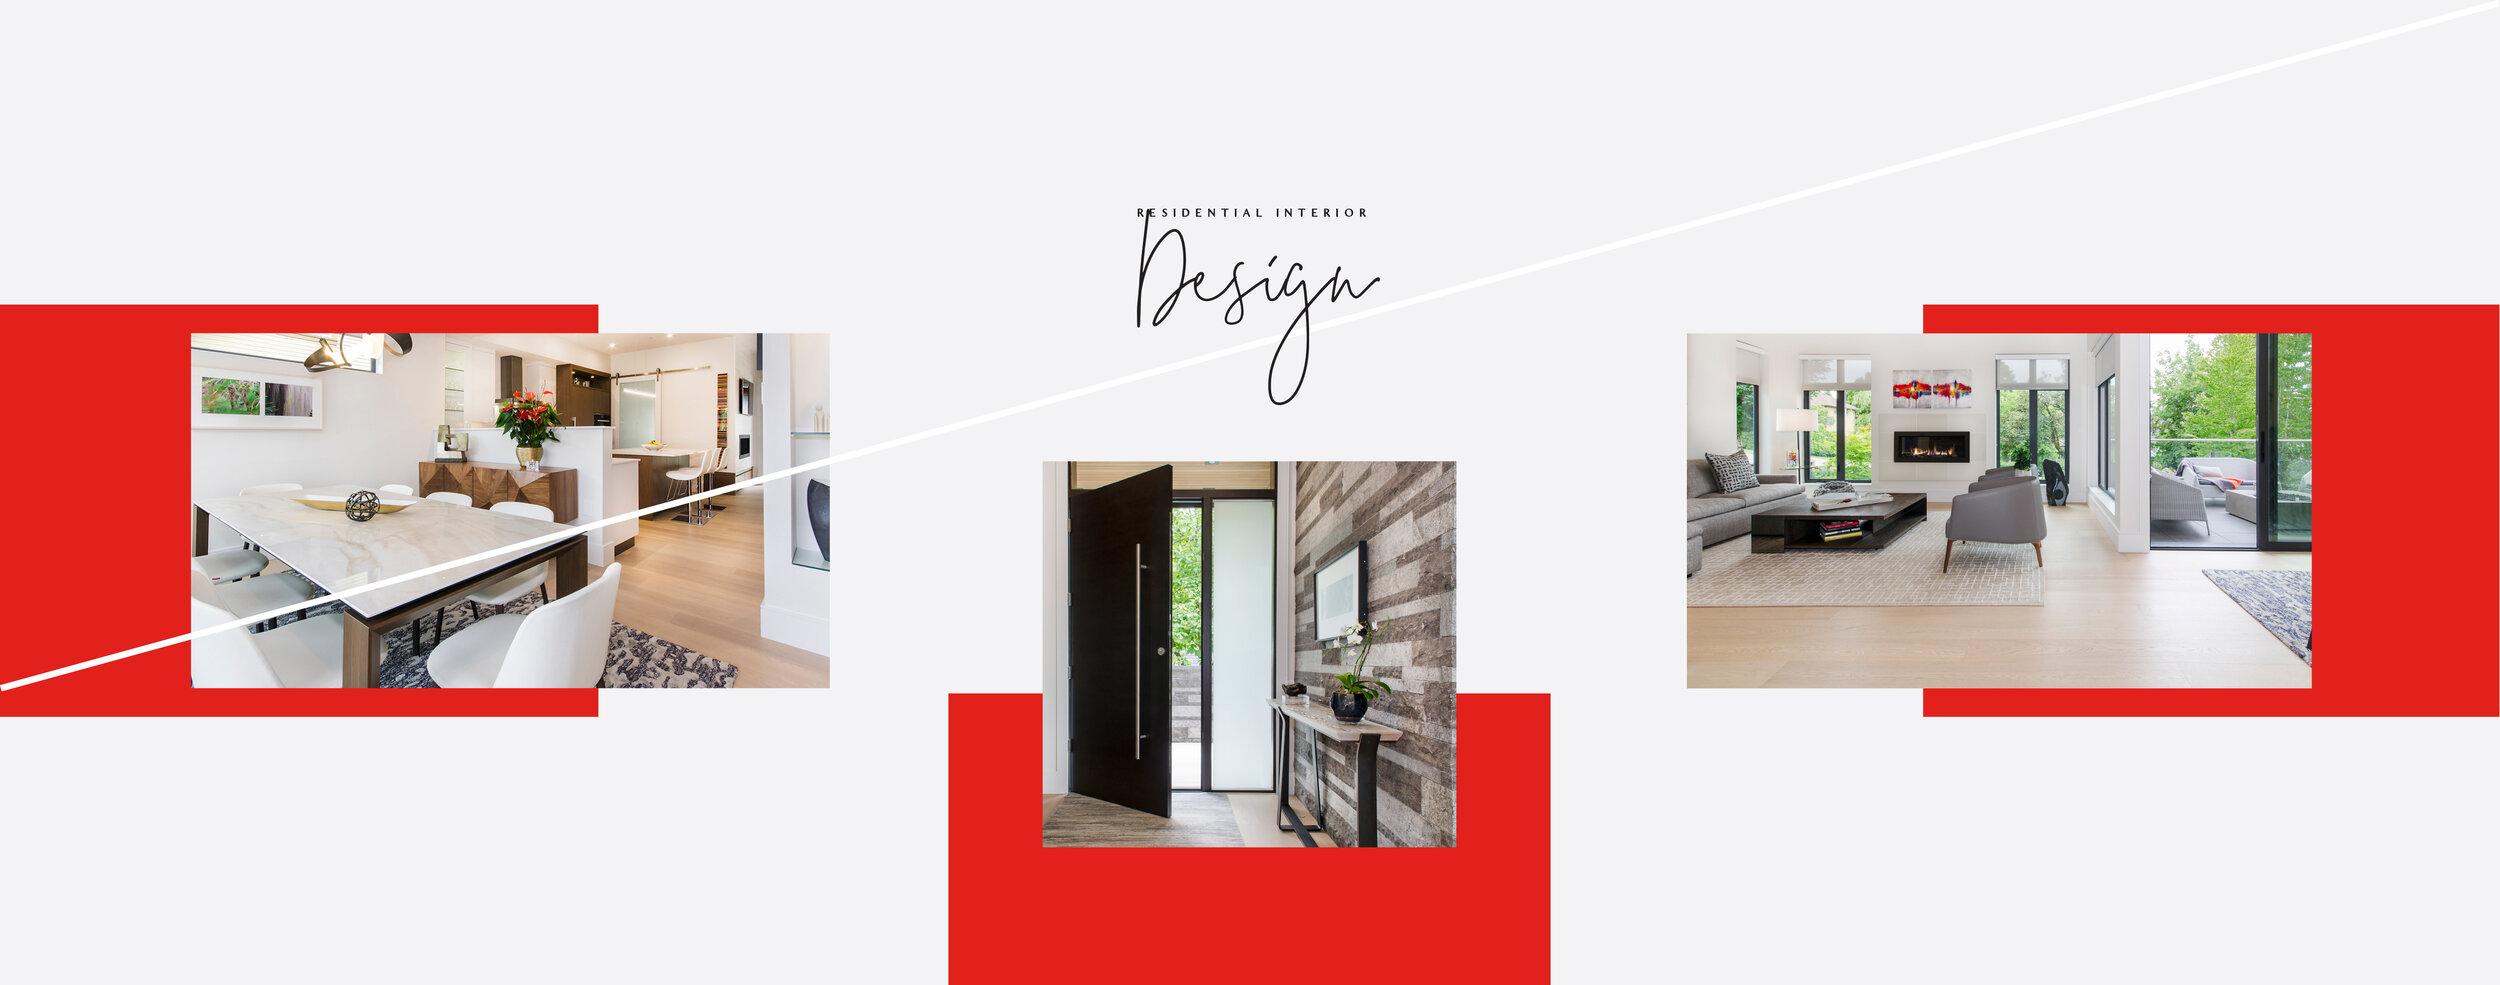 vancouver interior design 2.jpg